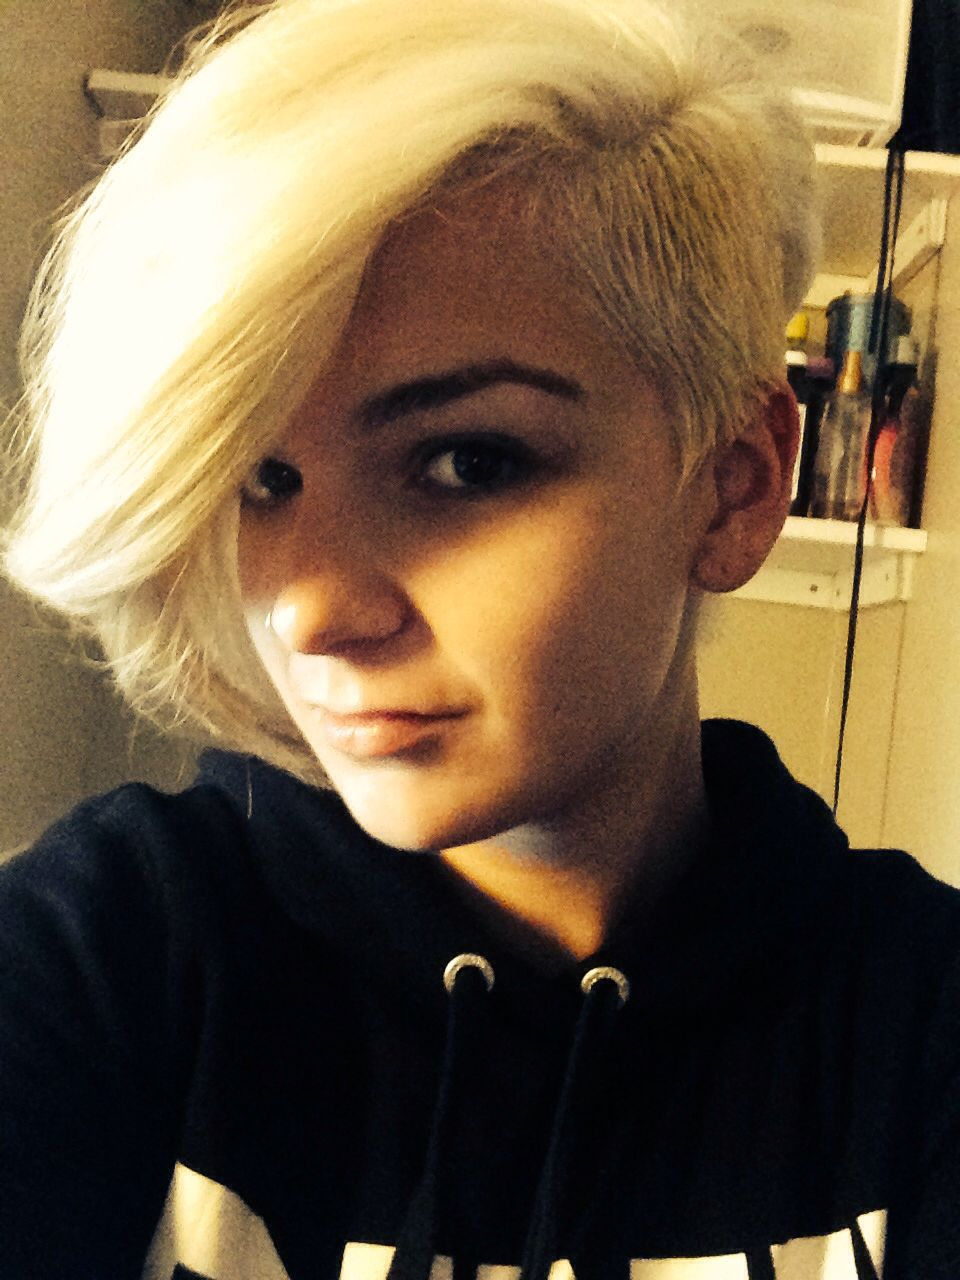 Undercut blonde love it shaved side Shaved sides Pinterest